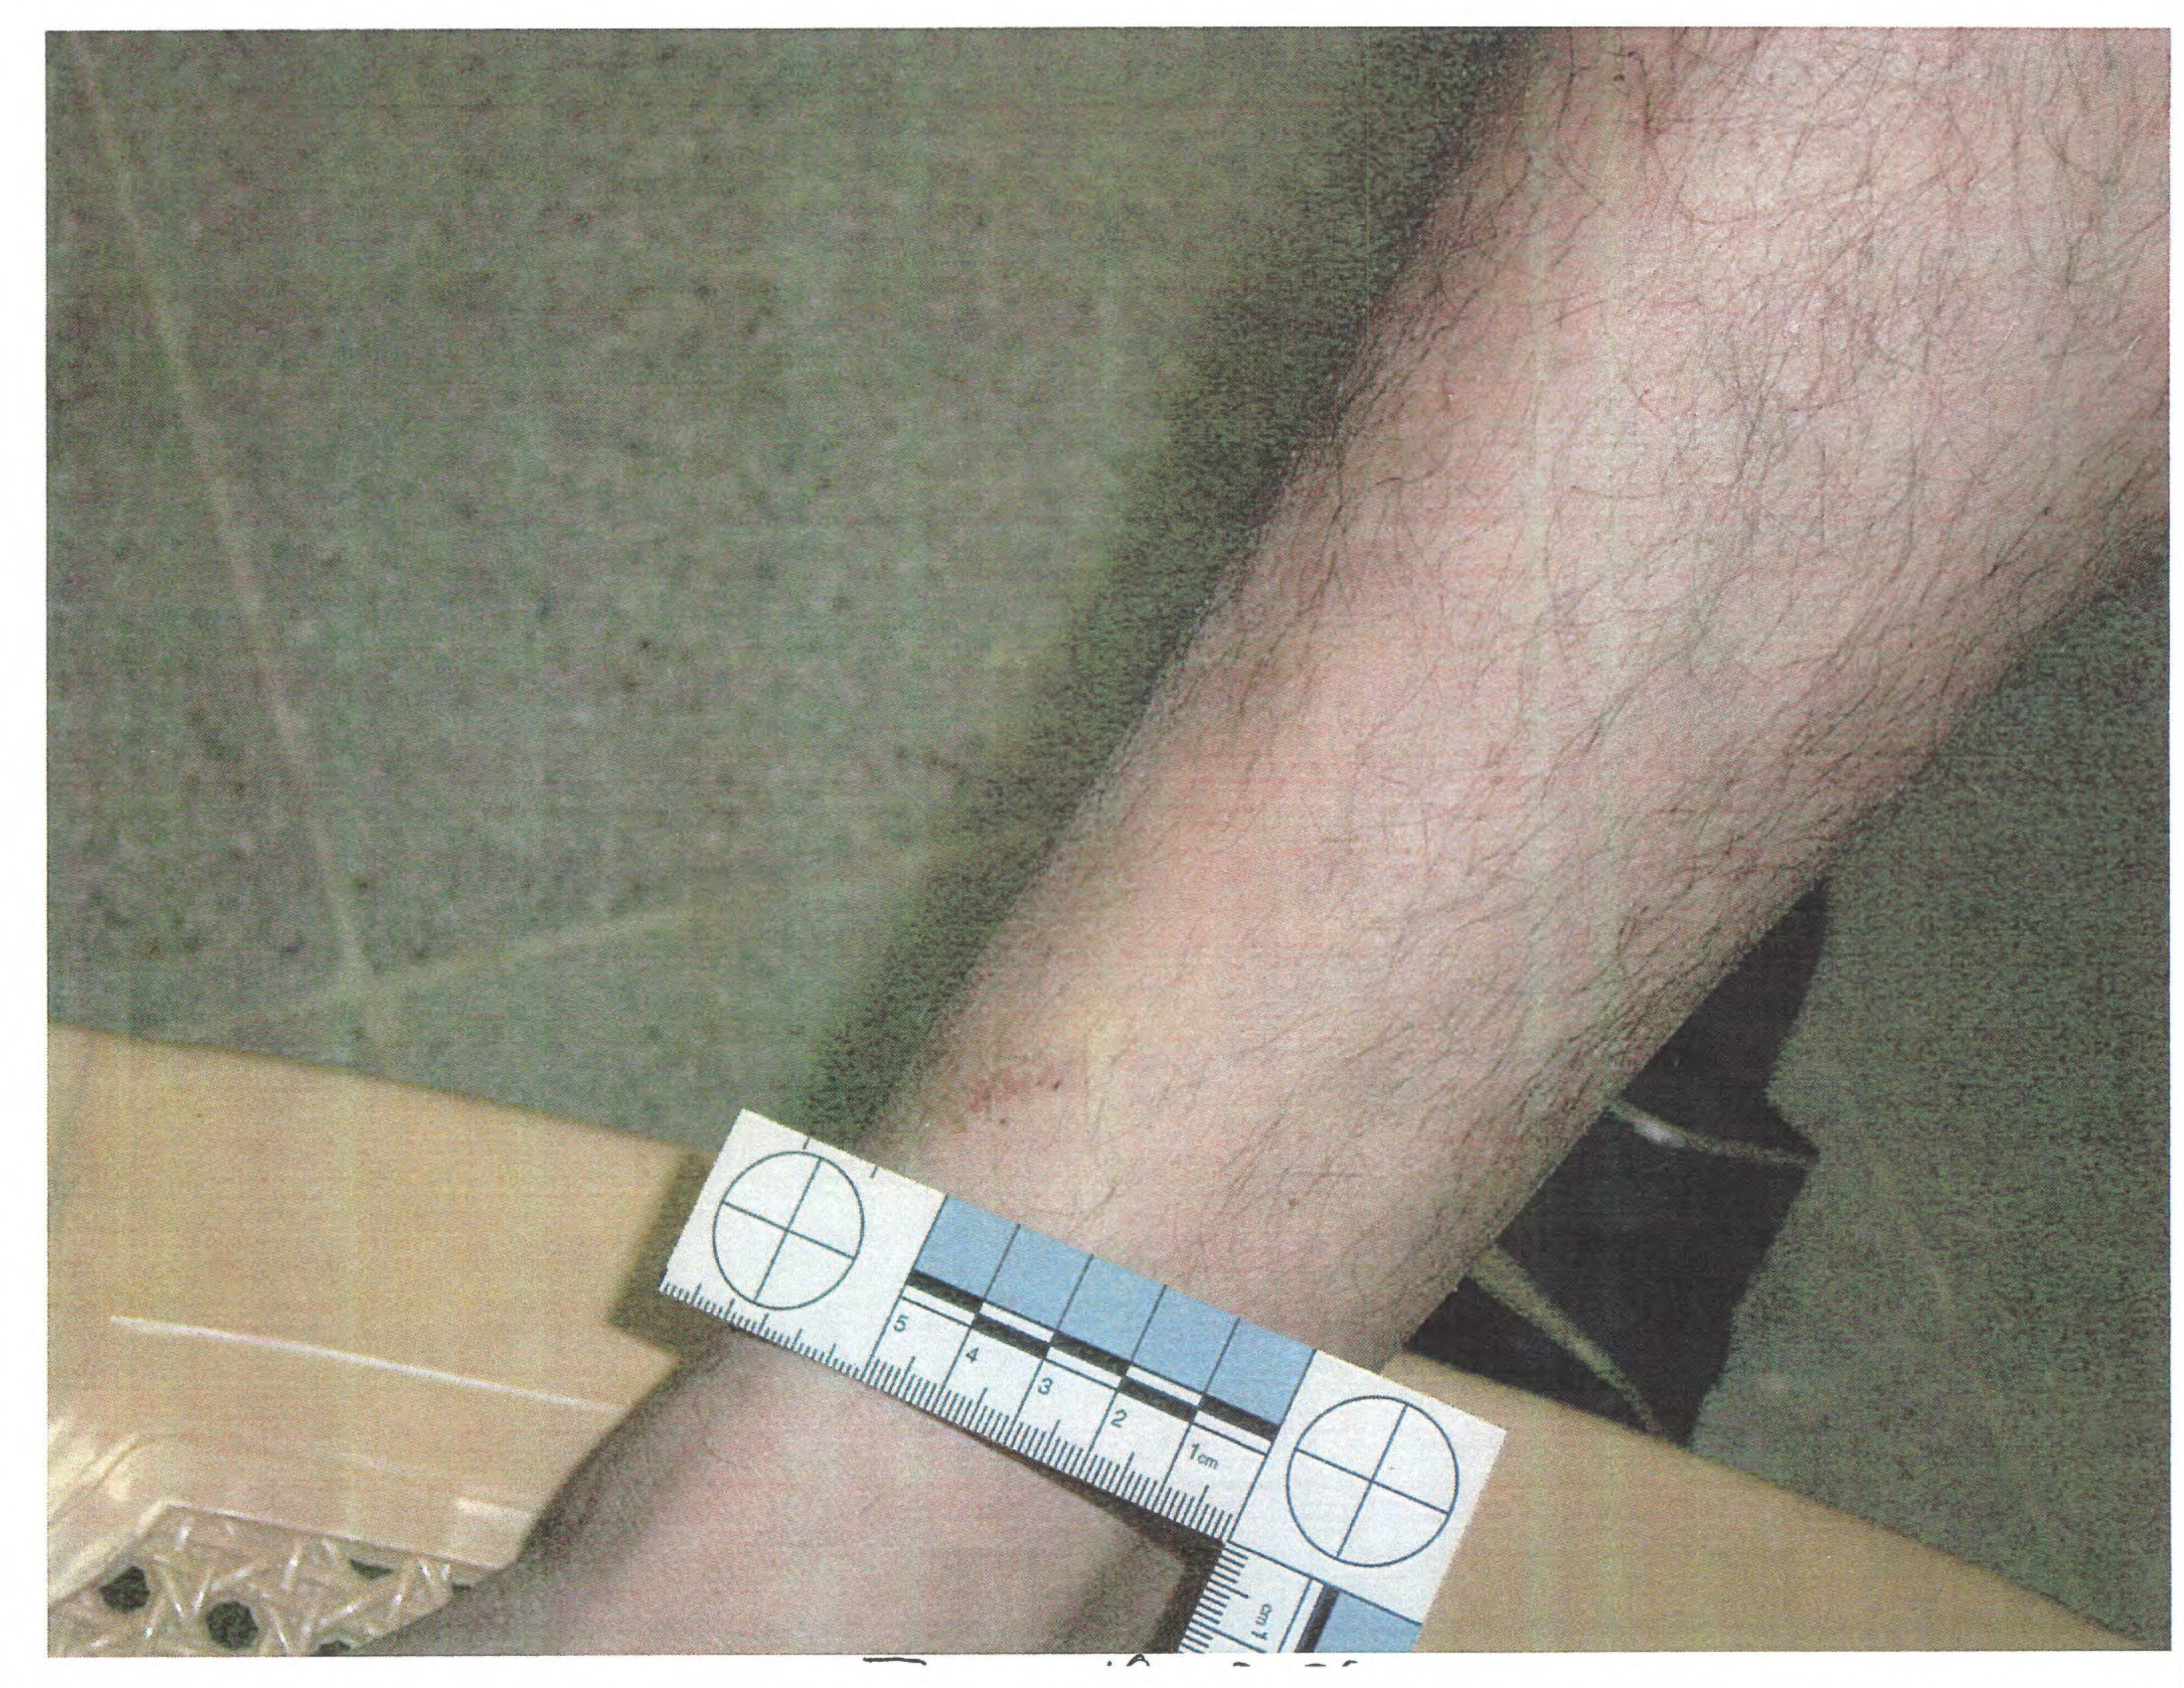 pentagon detainee abuse photos 2016